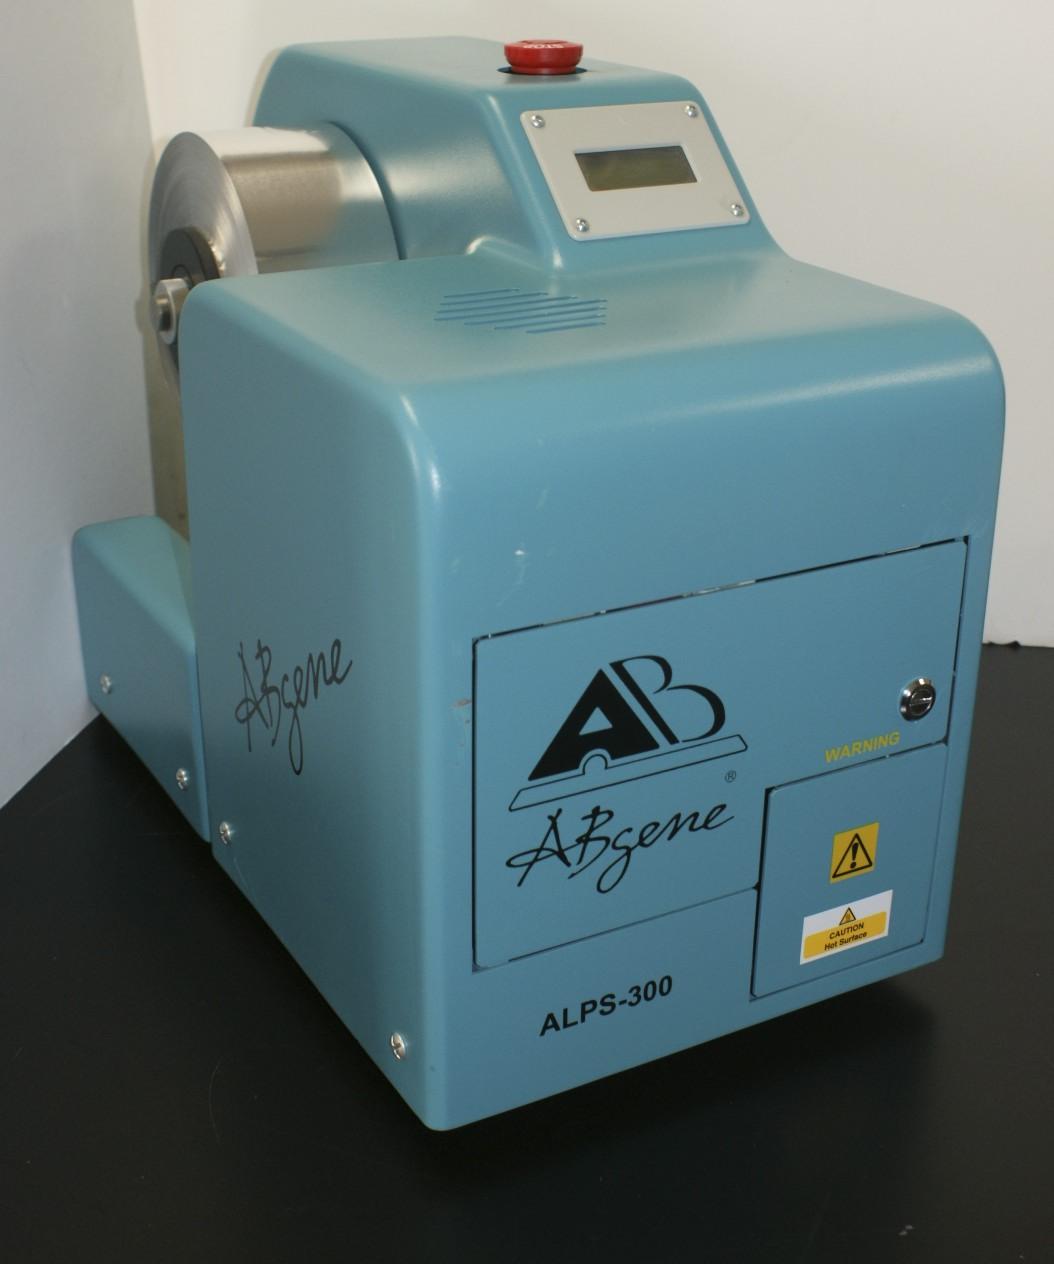 ABGene ALPS-300 Microplate Sealer ABGene ALPS300 AB Gene ALPS-300 AB Gene ALPS300 used nice